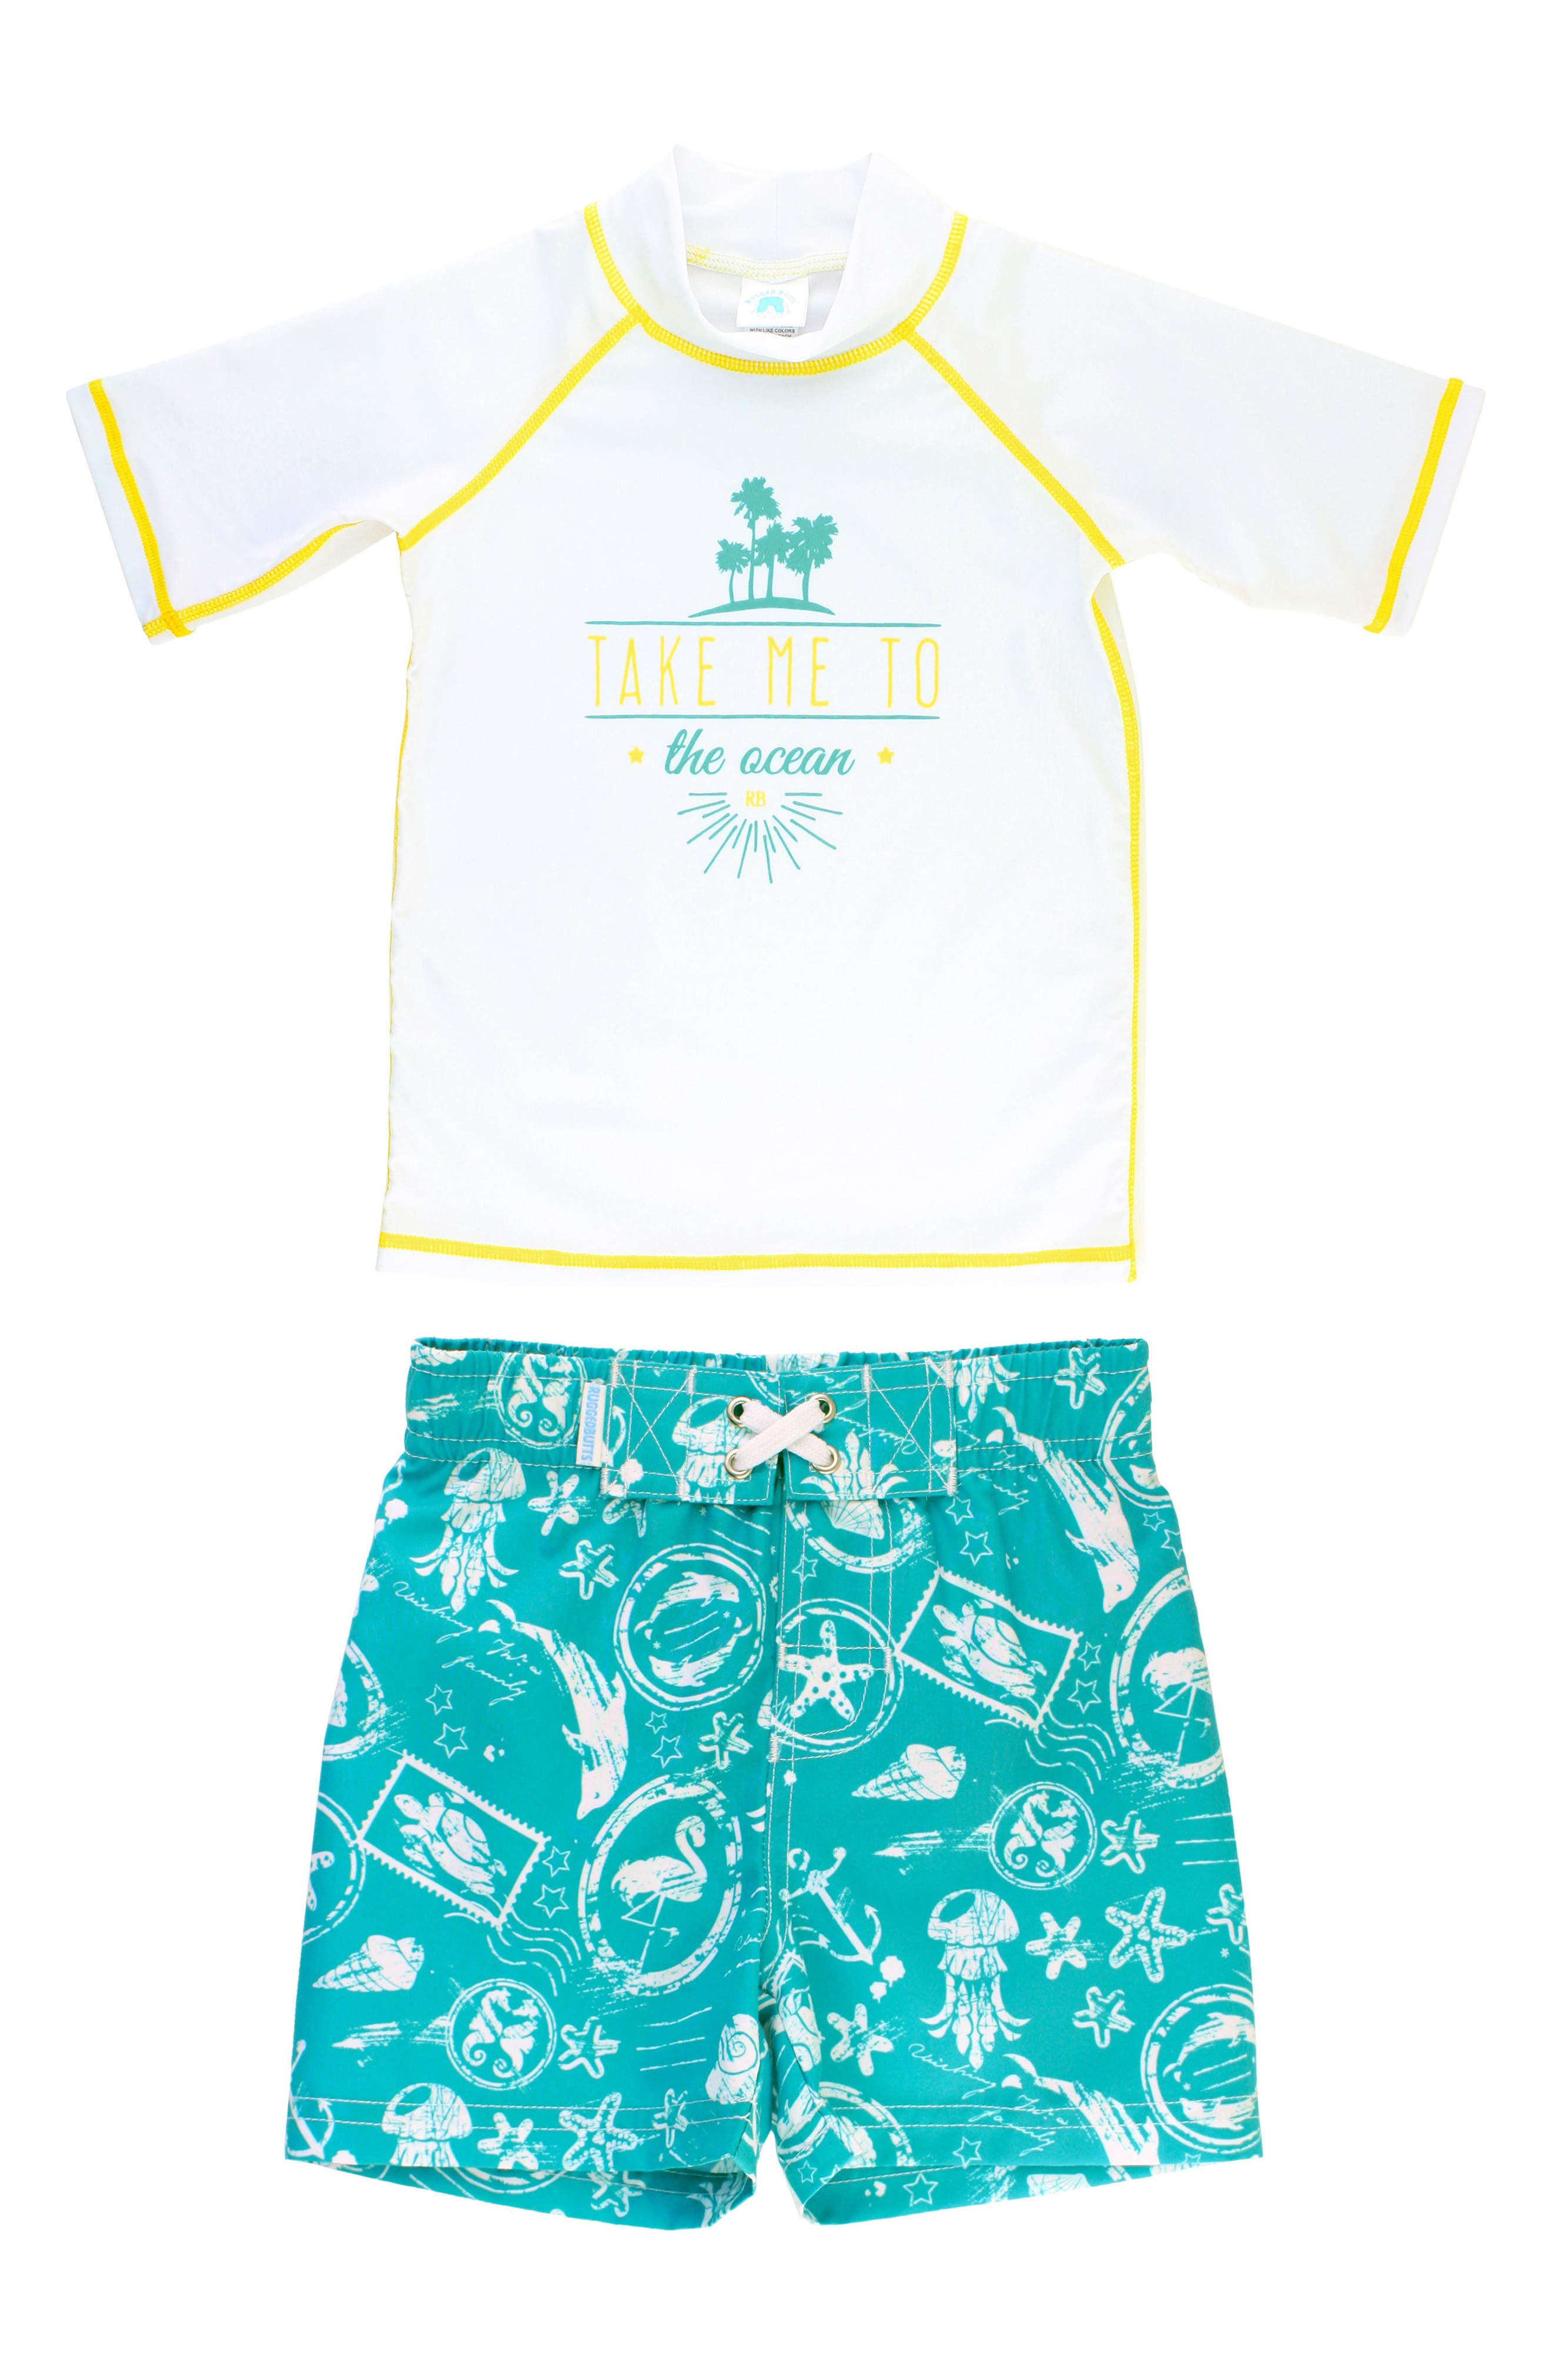 Main Image - RuggedButts Take Me to the Ocean Rashguard & Board Shorts Set (Toddler Boys & Little Boys)